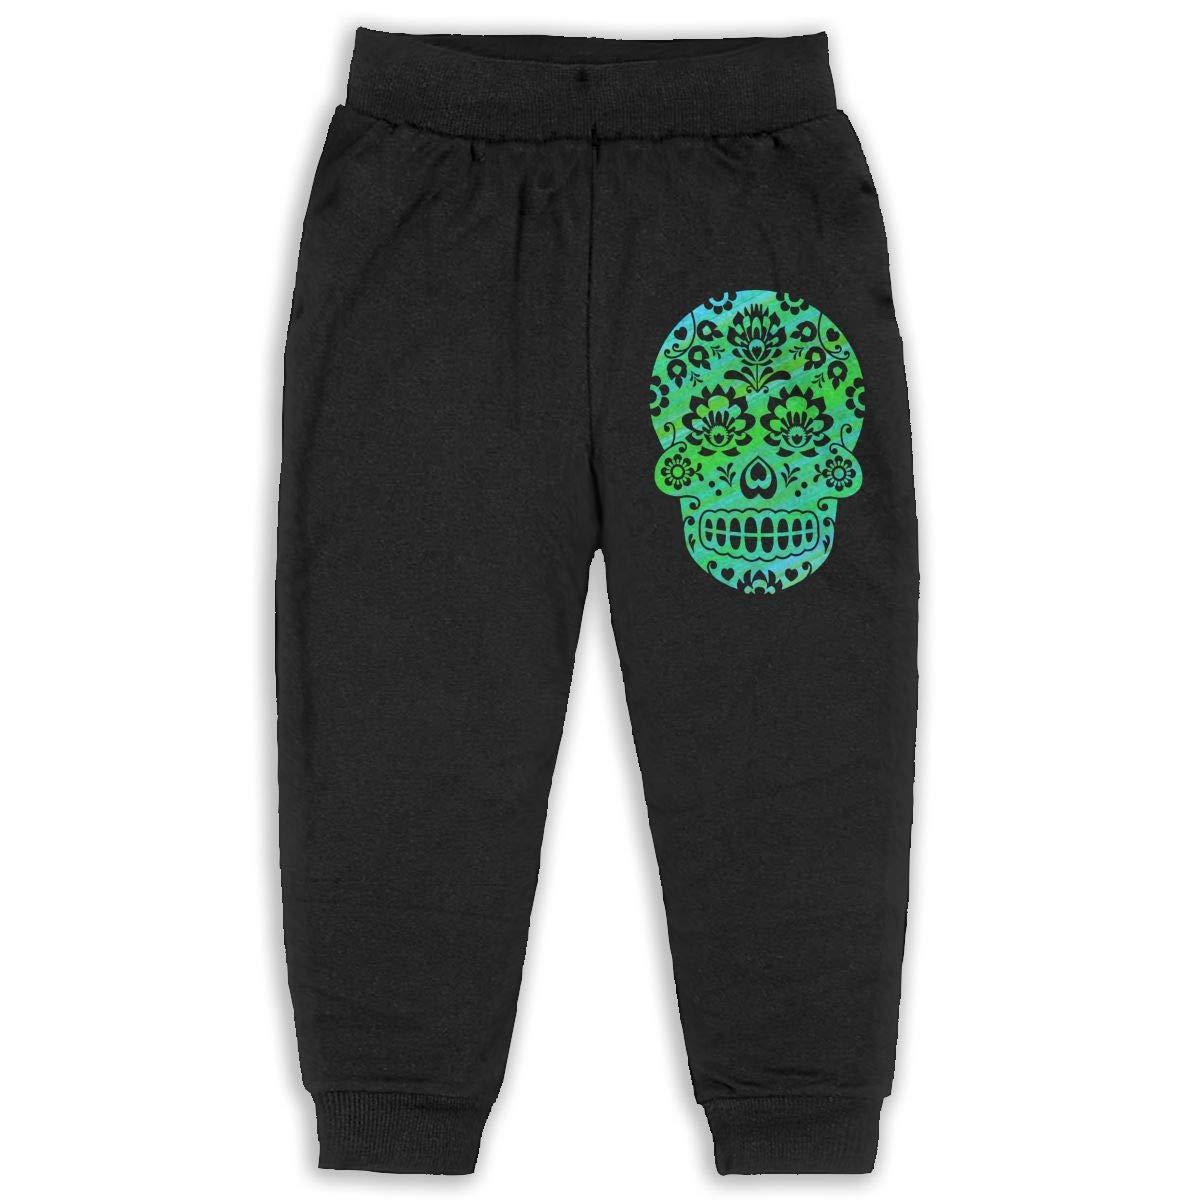 Kids /& Toddler Pants Soft Cozy Baby Sweatpants Mexican Sugar Skull Fleece Pants Sports Pants